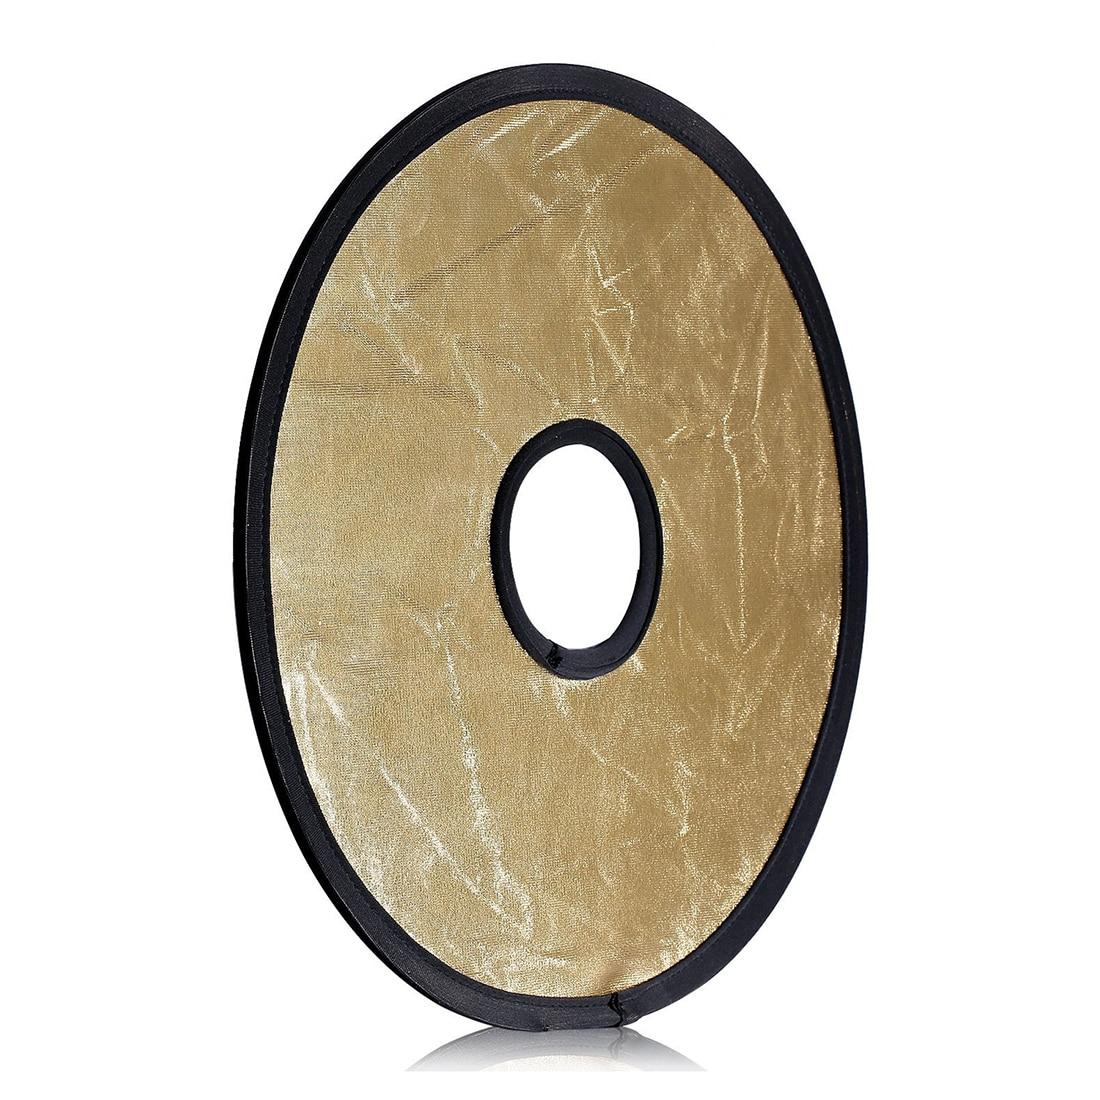 12 30CM 2 in 1 Gold Silver Portable Circular Collapsible Lens Mount Light Reflector